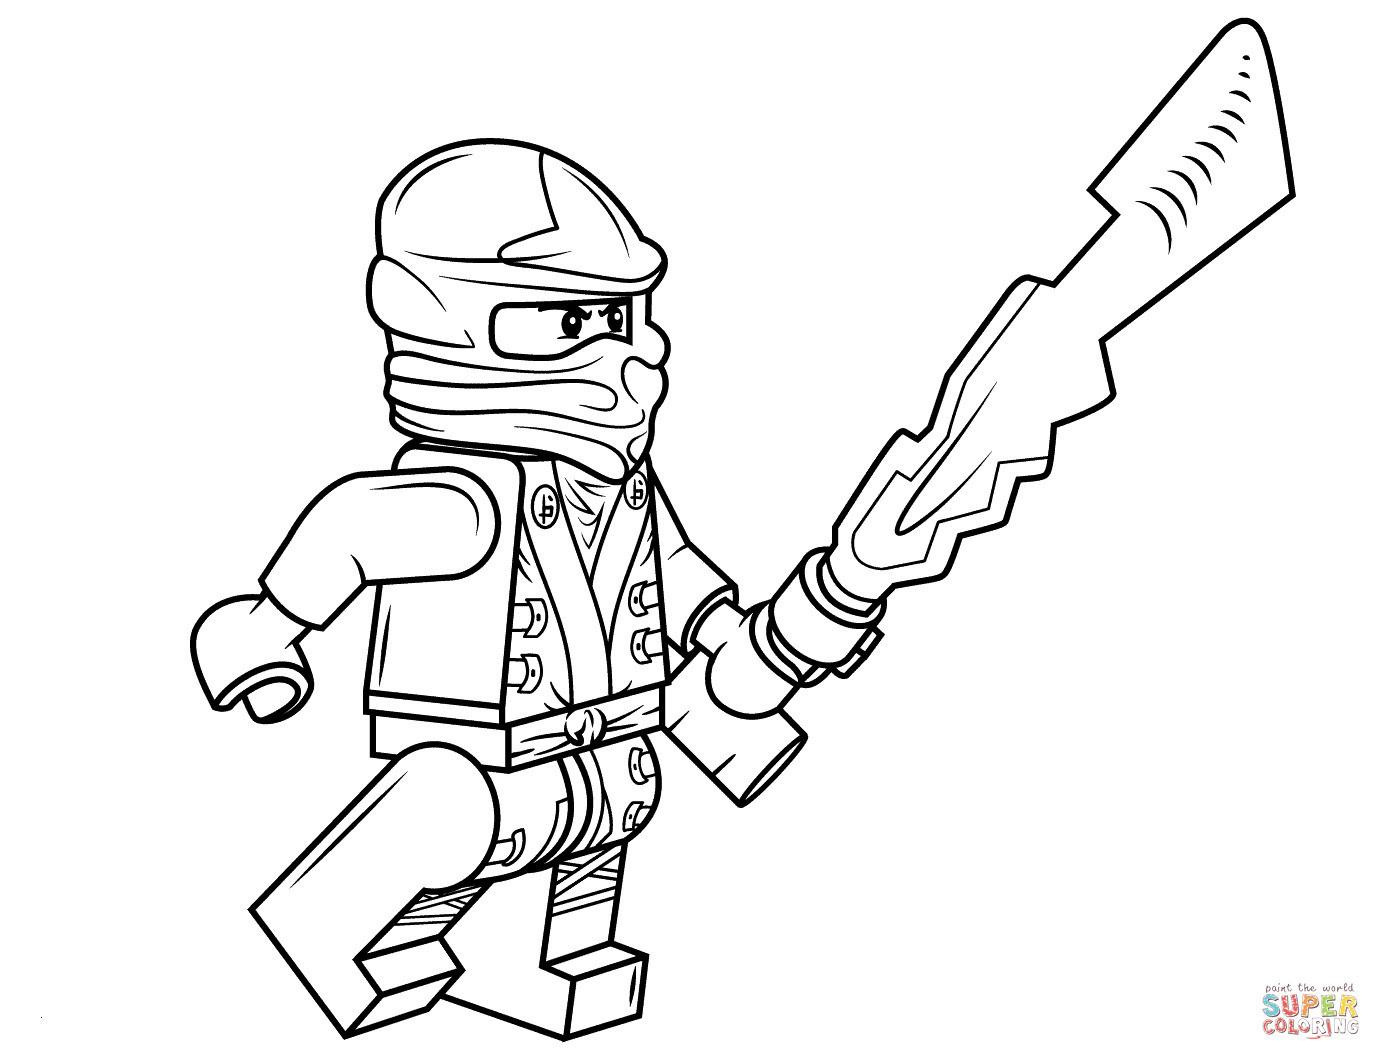 Ausmalbilder Ninjago Pythor Genial 40 Ninjago Ausmalbilder Nya forstergallery Stock